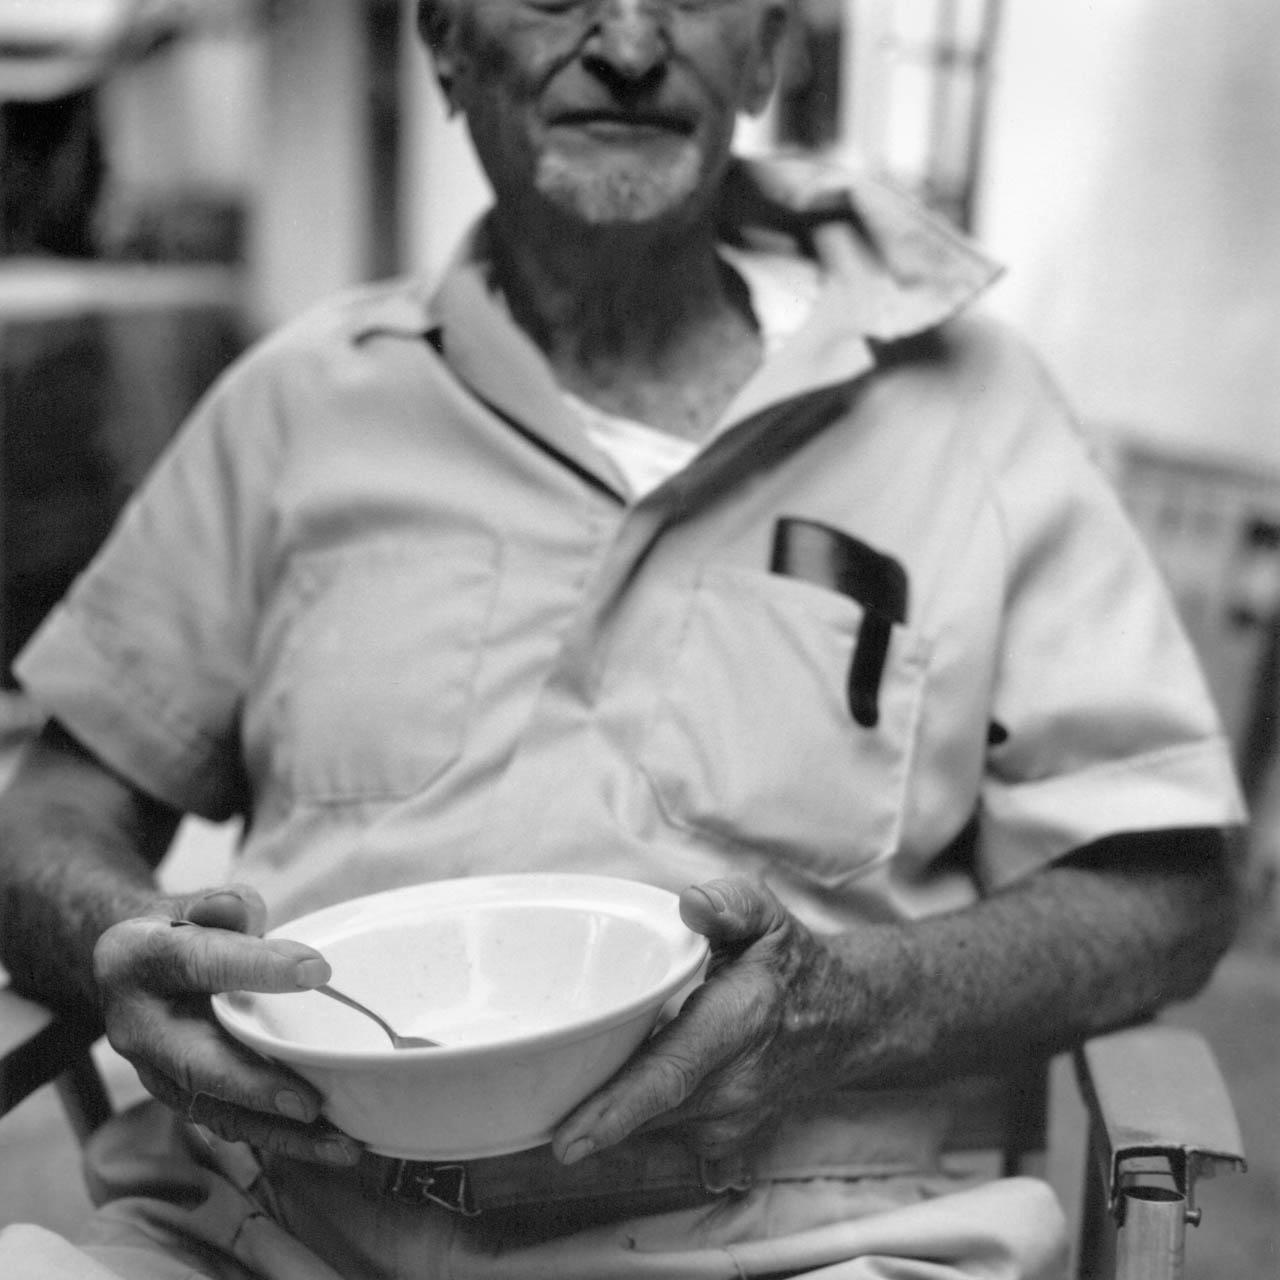 man holding cereal_.jpg